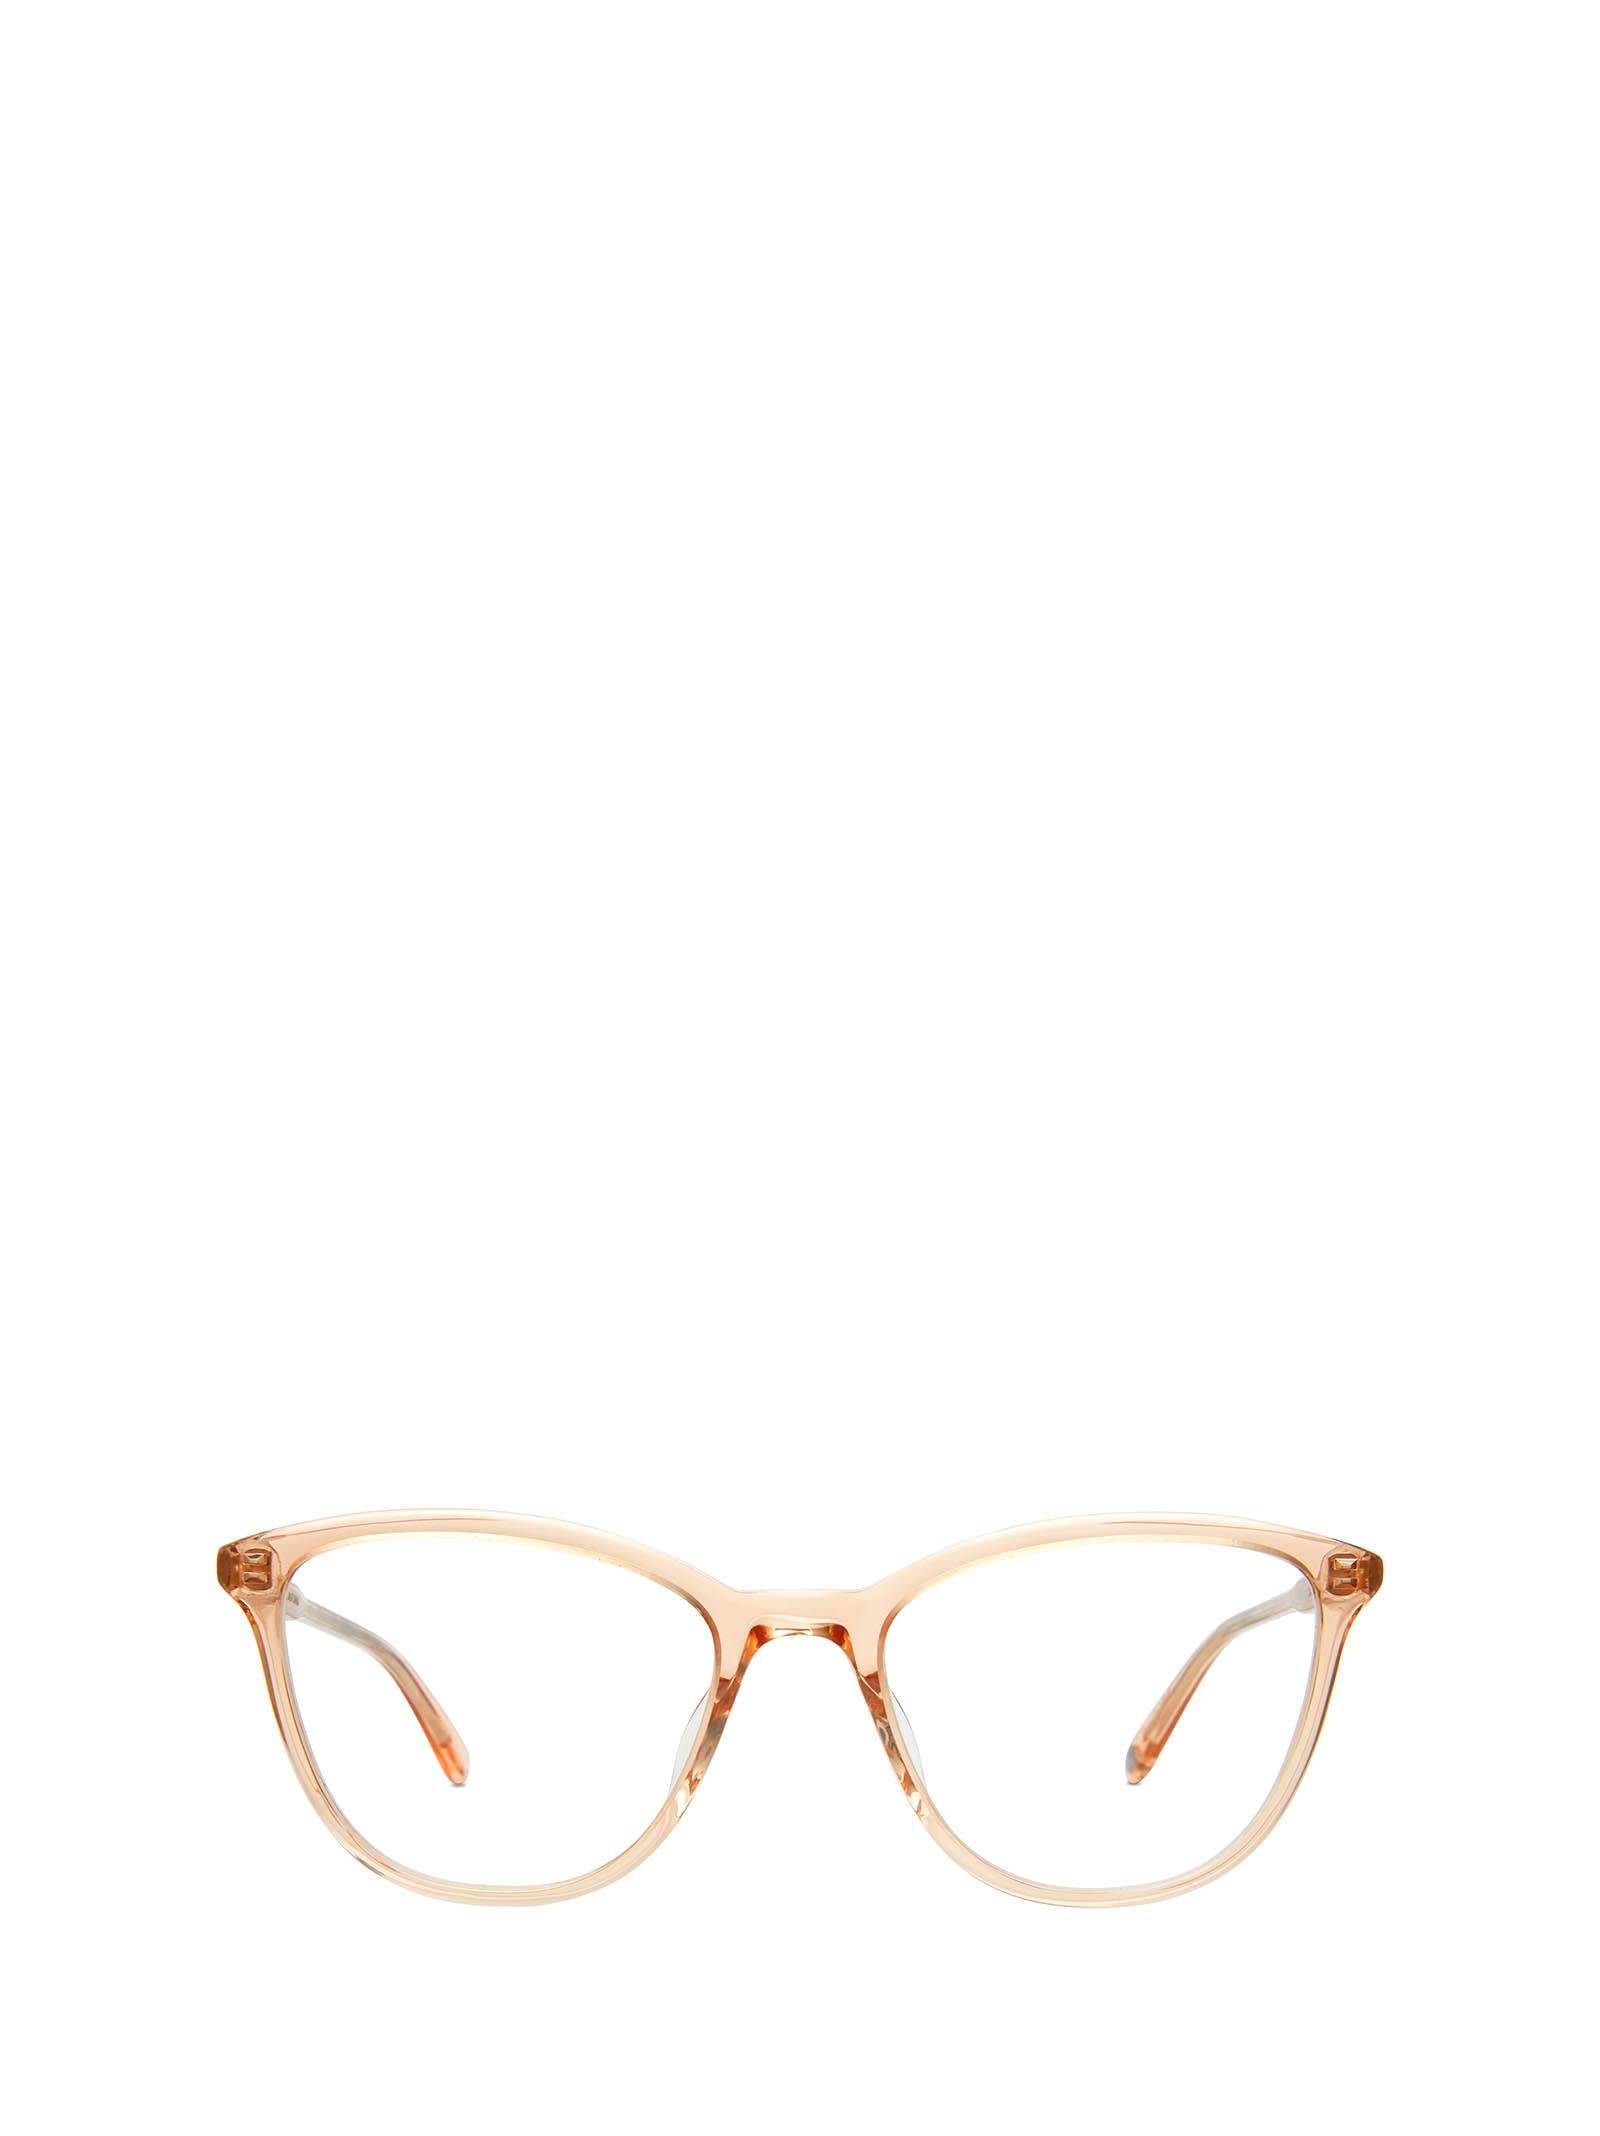 Garrett Leight Garrett Leight Star Pink Crystal Glasses